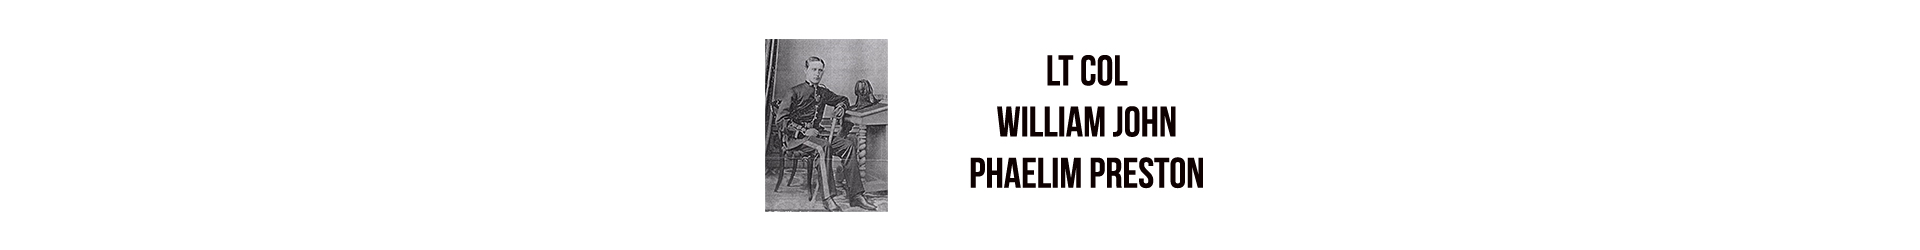 Lt Col William John Phaelim Preston D.S.O., O.B.E. – 1873-1943